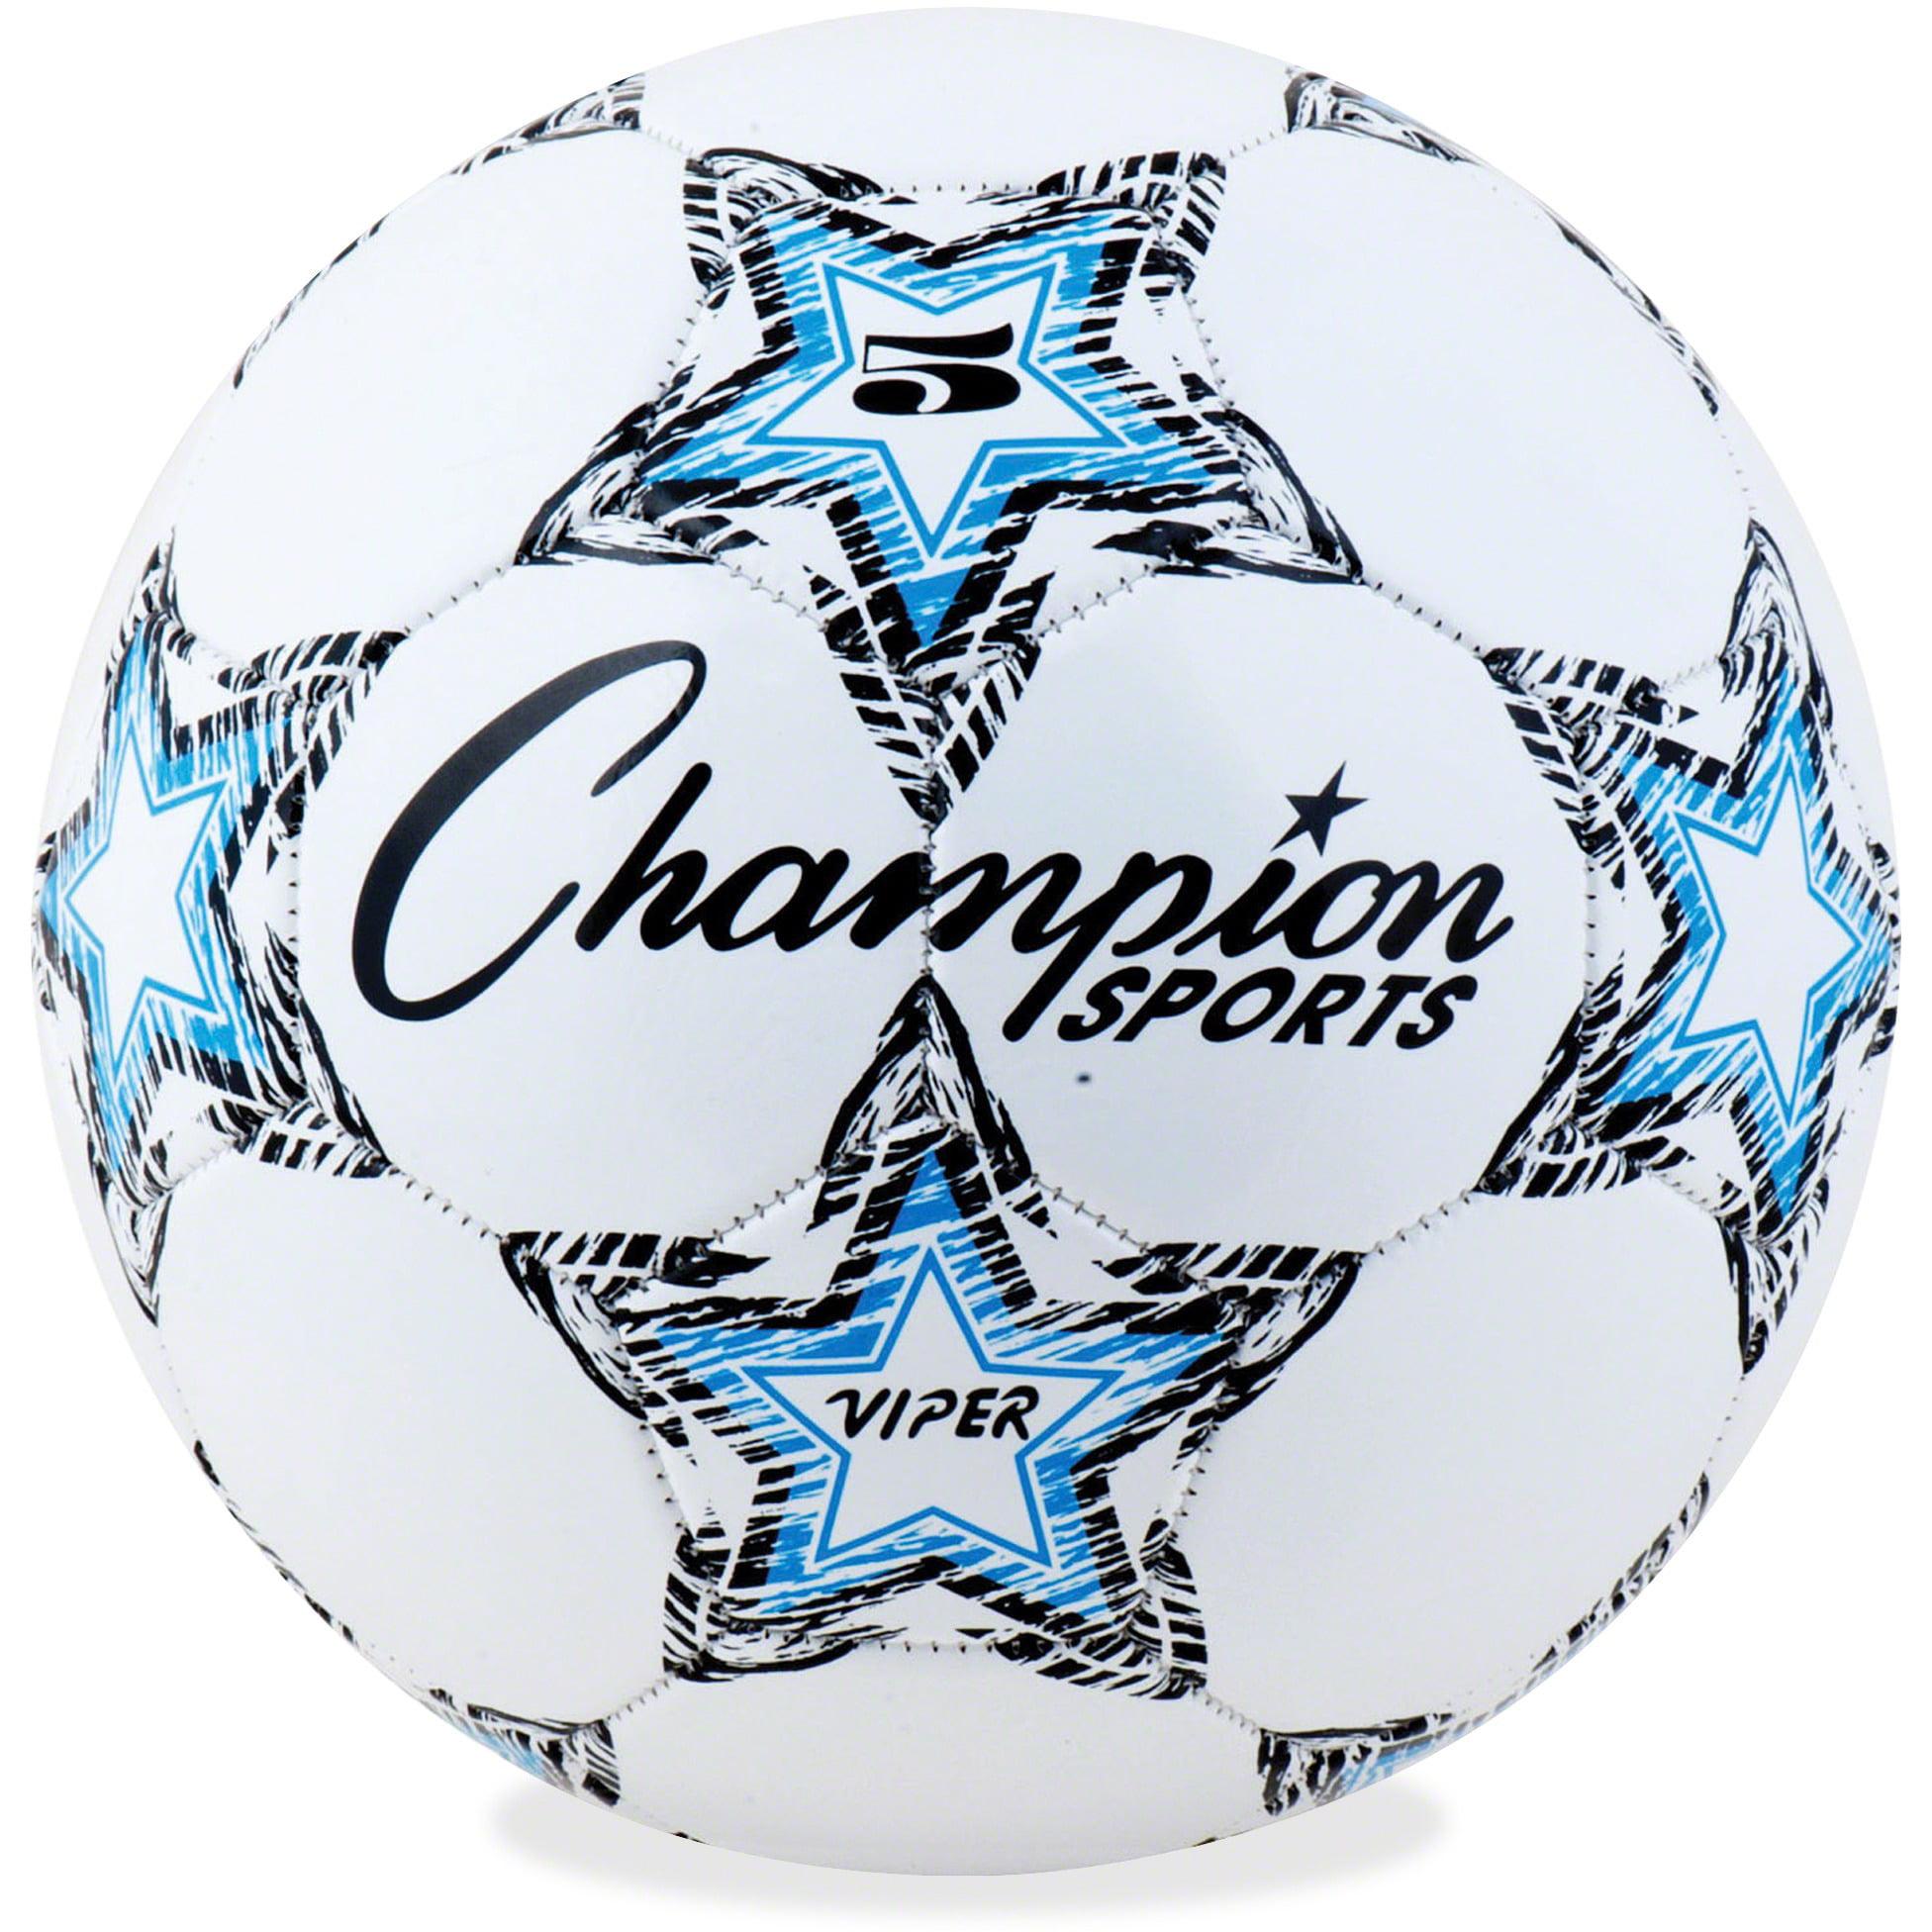 Champion Sport s Size 5 Viper Soccer Ball, White, Blue, Black, 1 Each (Quantity)